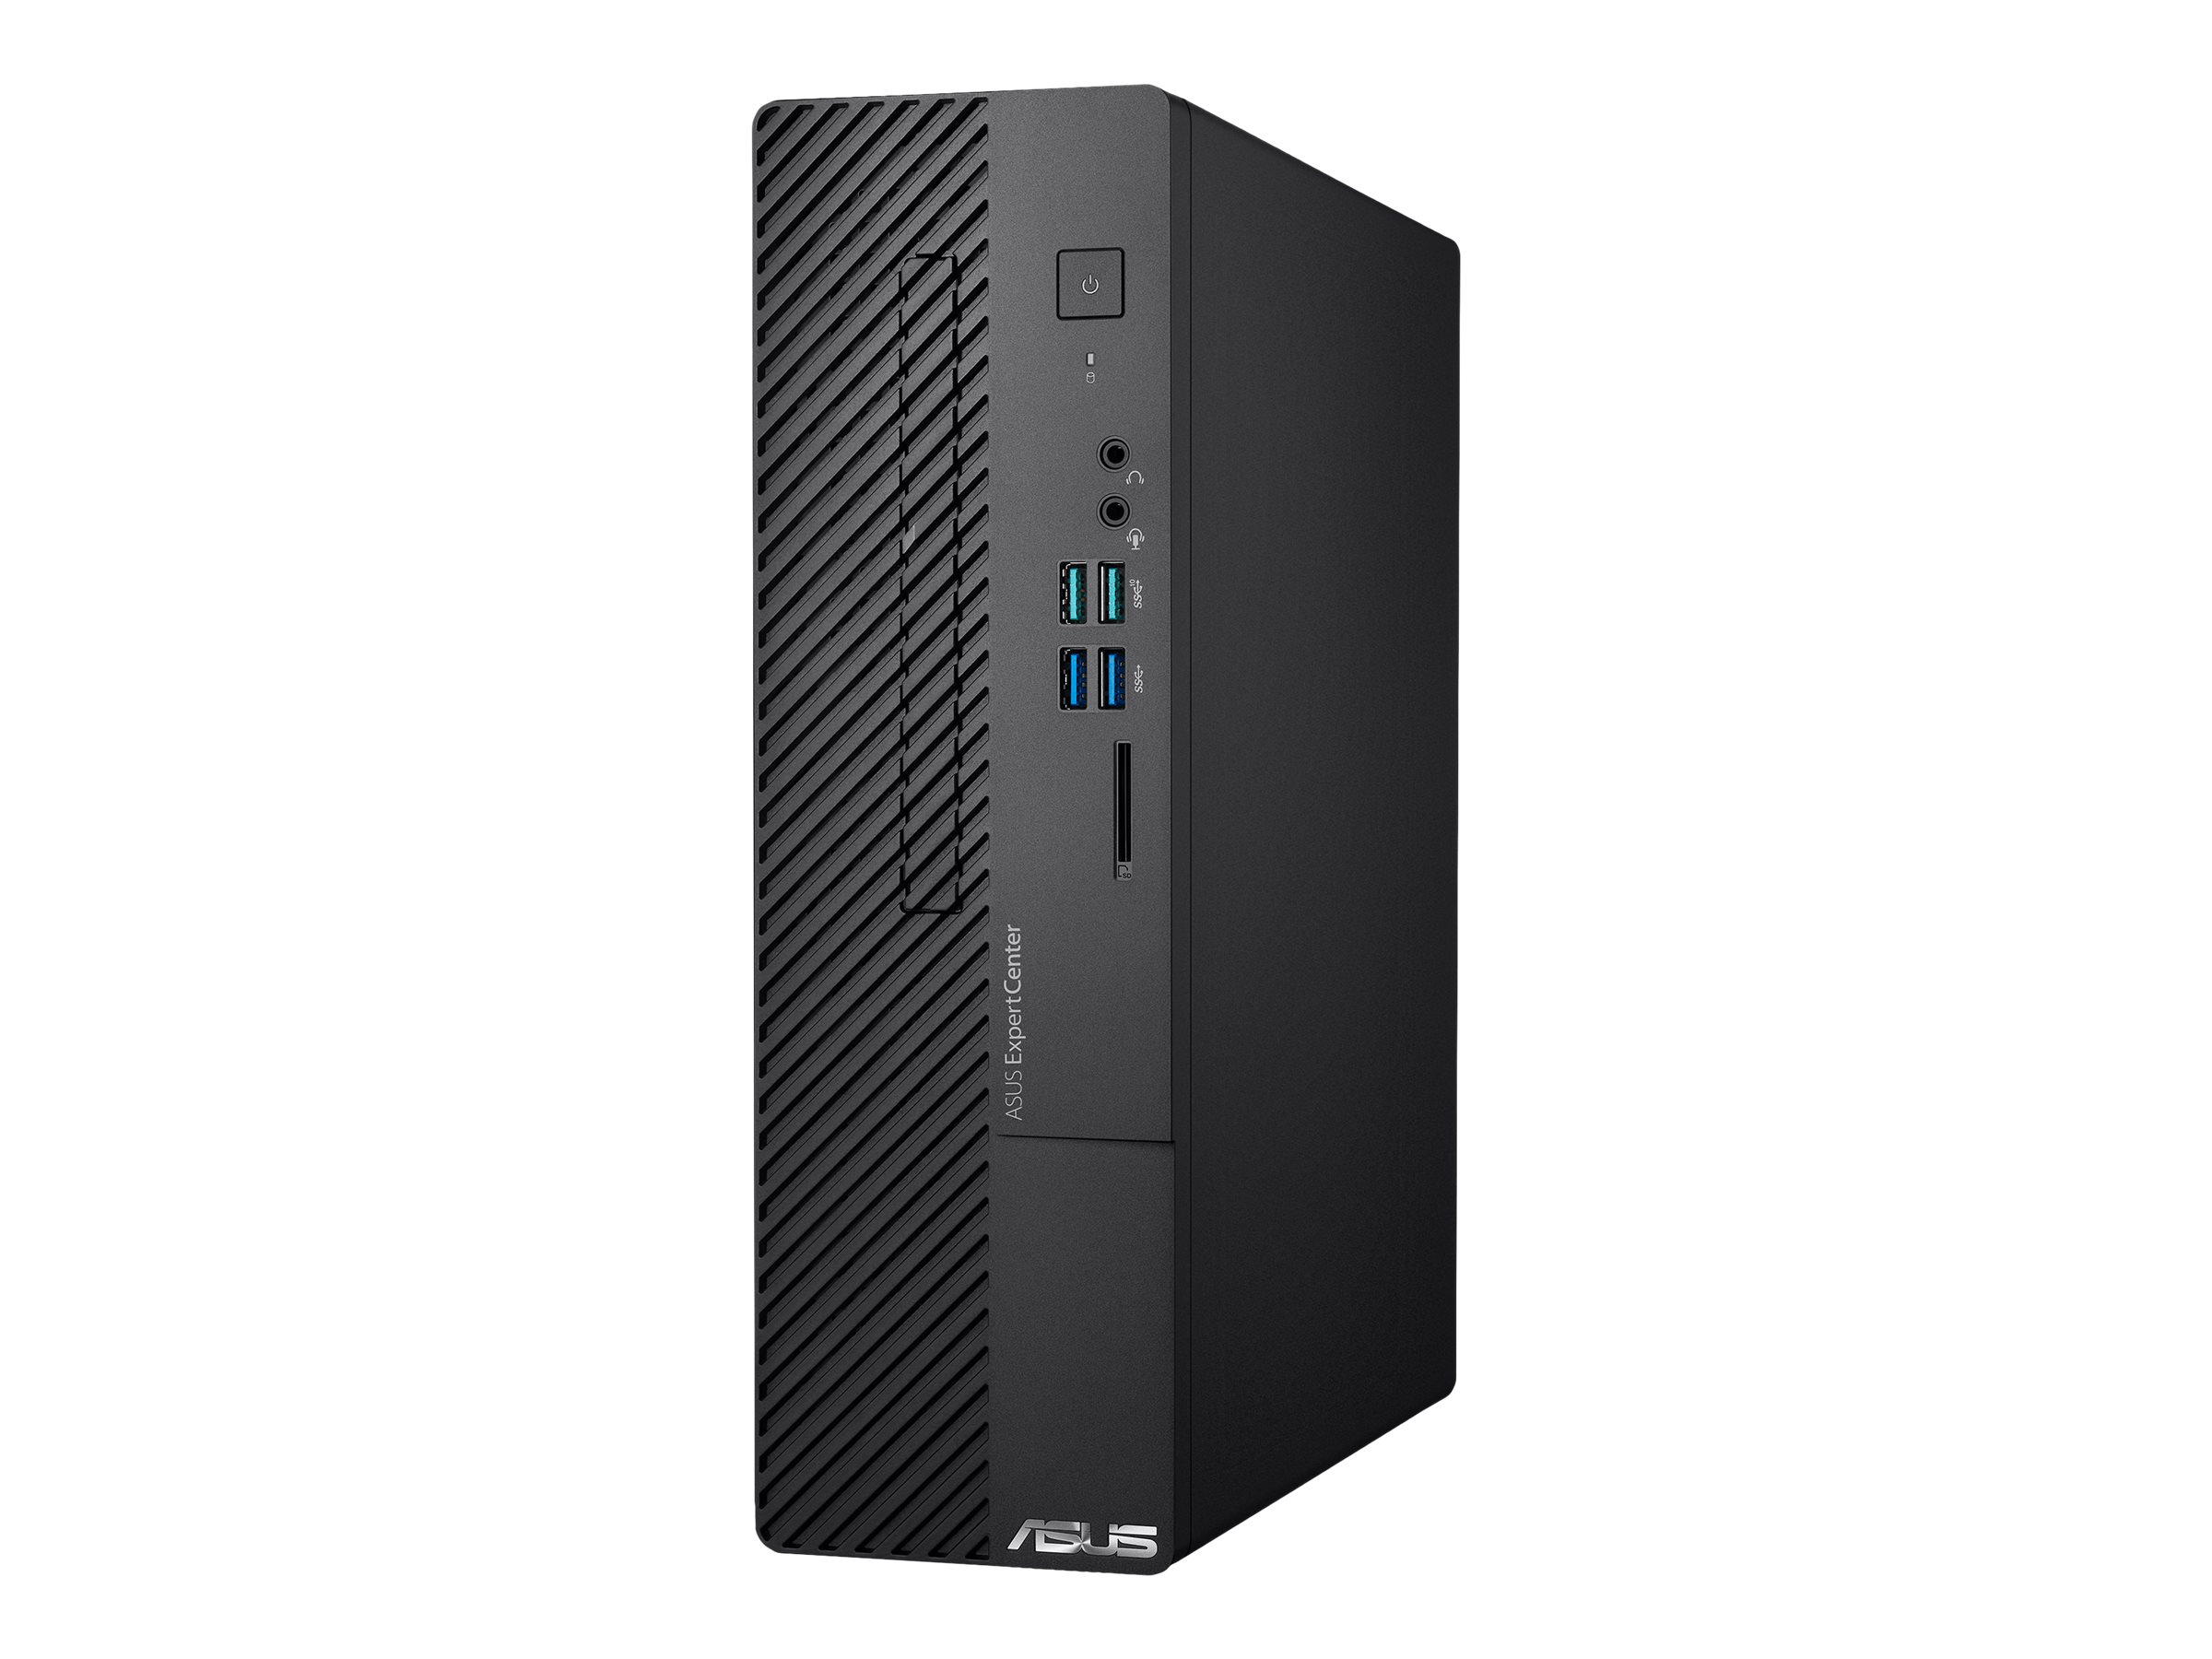 ASUS ExpertCenter D5 SFF D500SC 511400036R - SFF